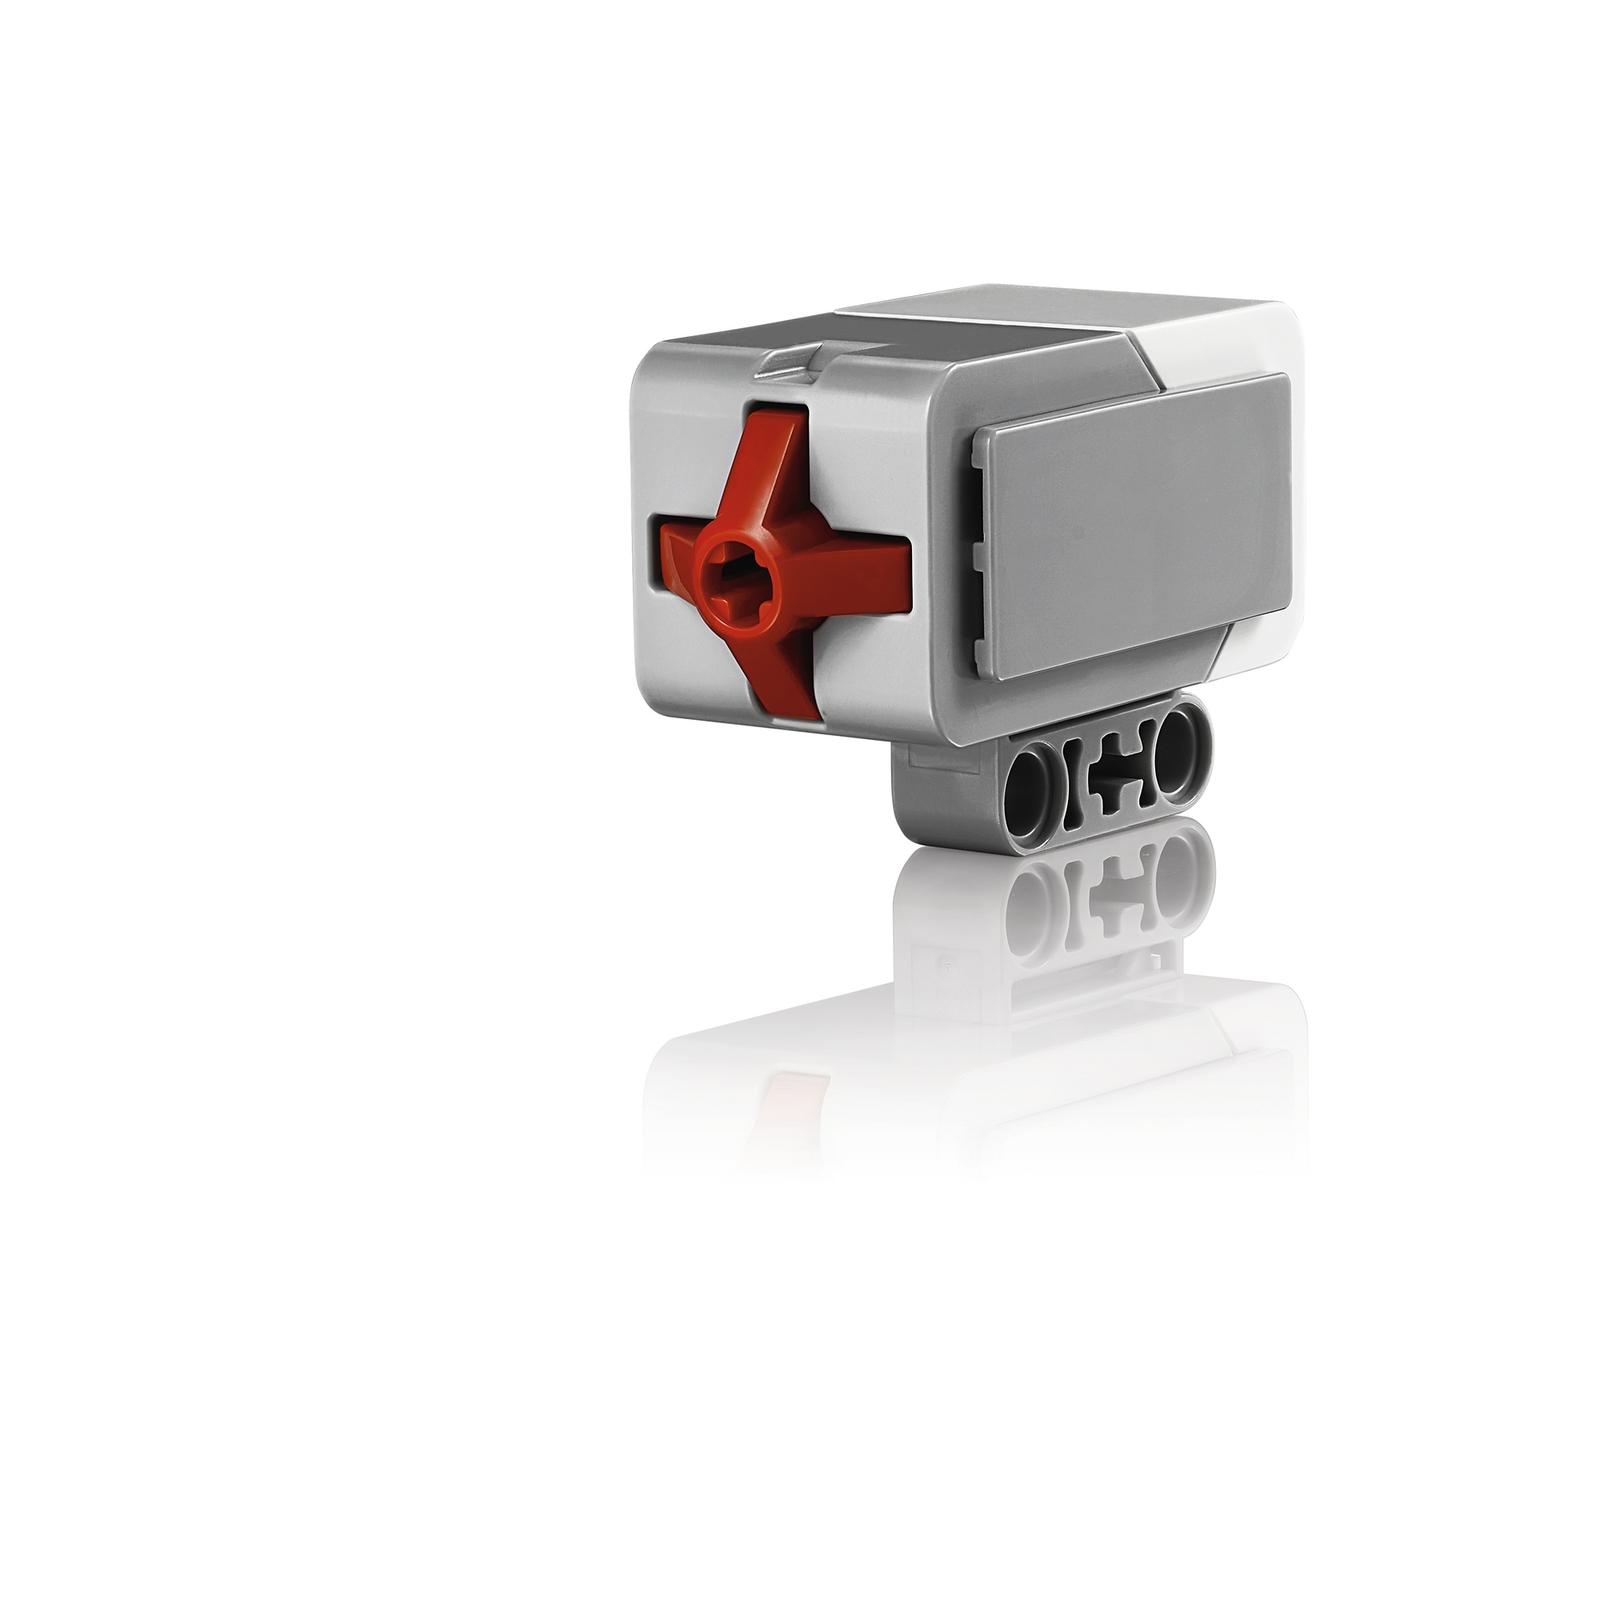 LEGO® MINDSTORMS® Education EV3 Touch Sensor